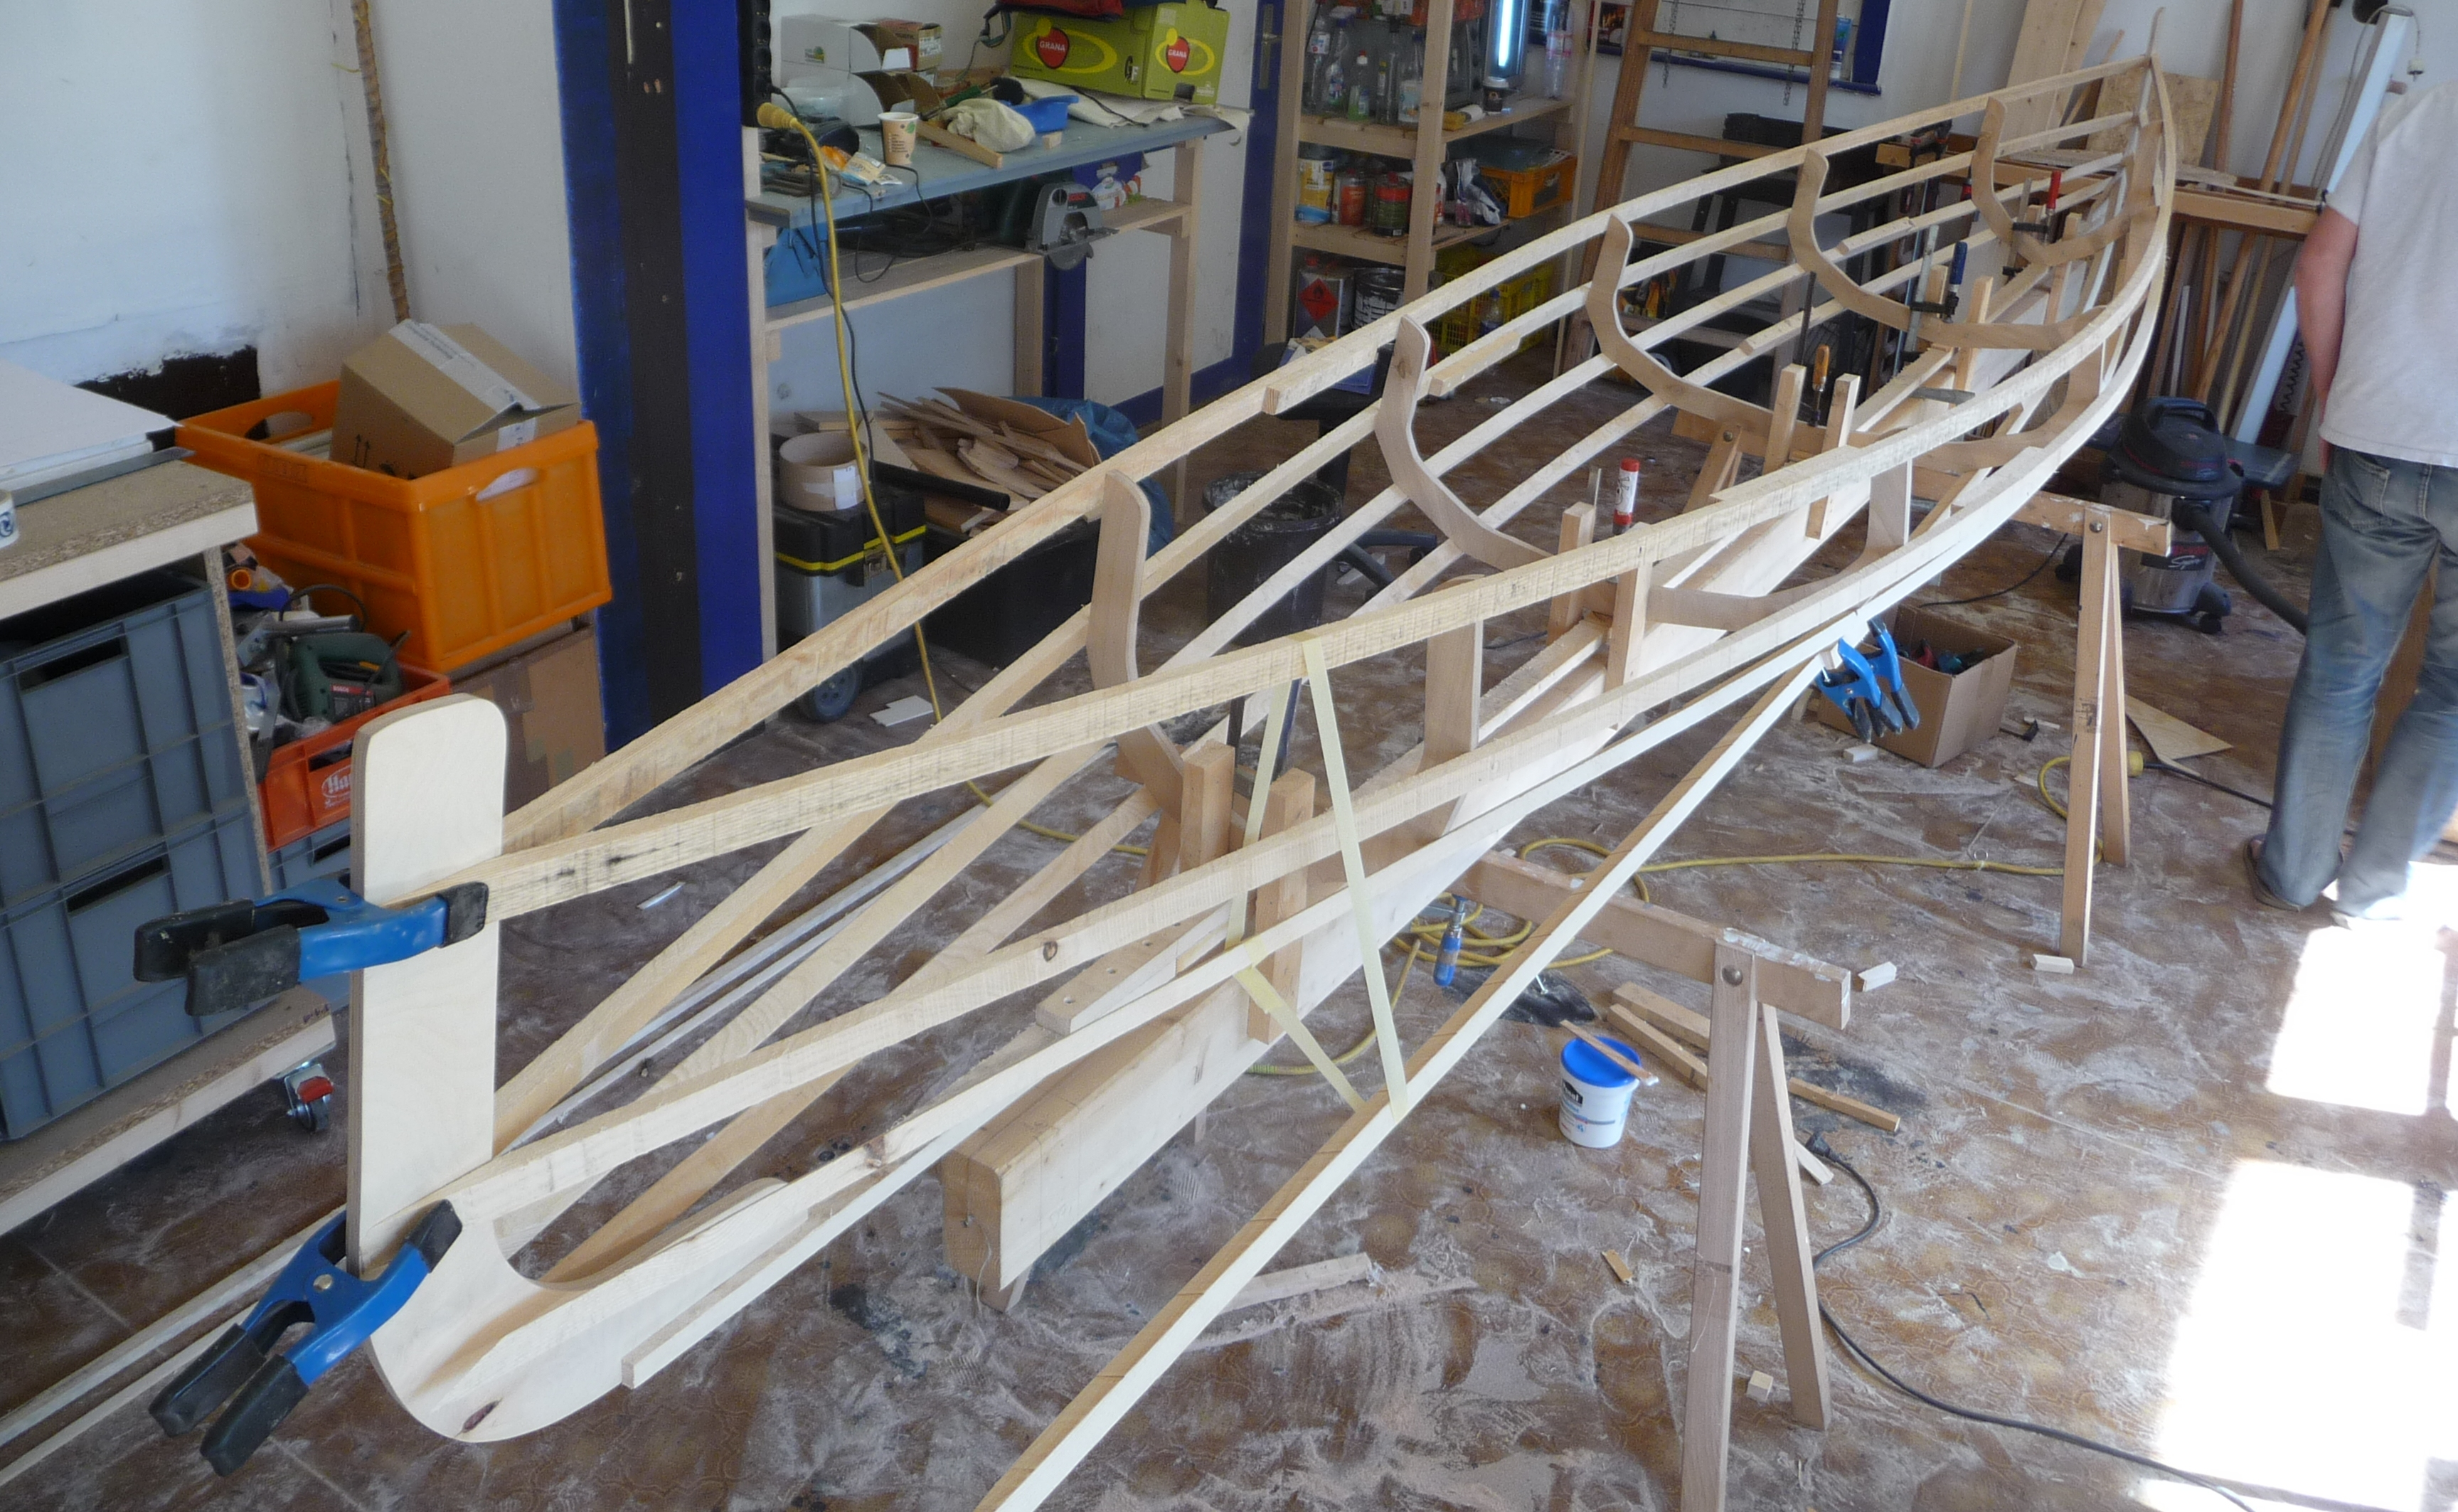 kanadier selber bauen im kanubau workshop in berlin urbanindian. Black Bedroom Furniture Sets. Home Design Ideas